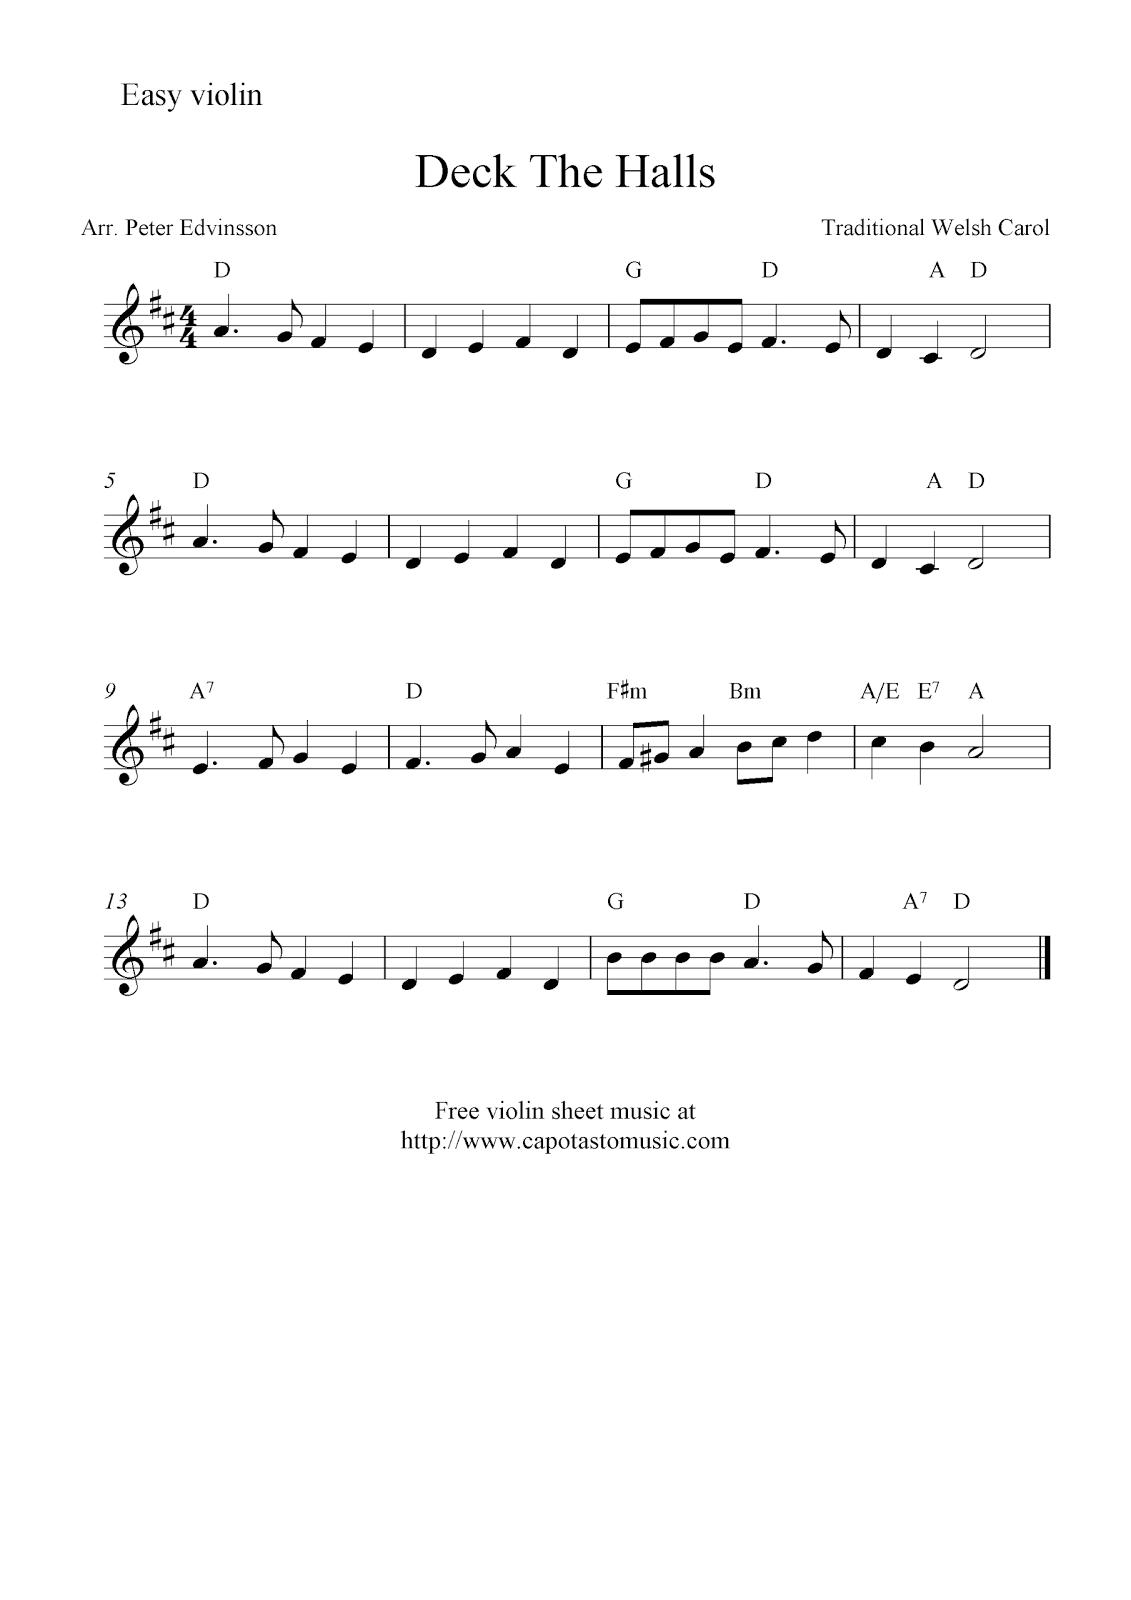 Free violin sheet music deck the halls free christmas violin sheet